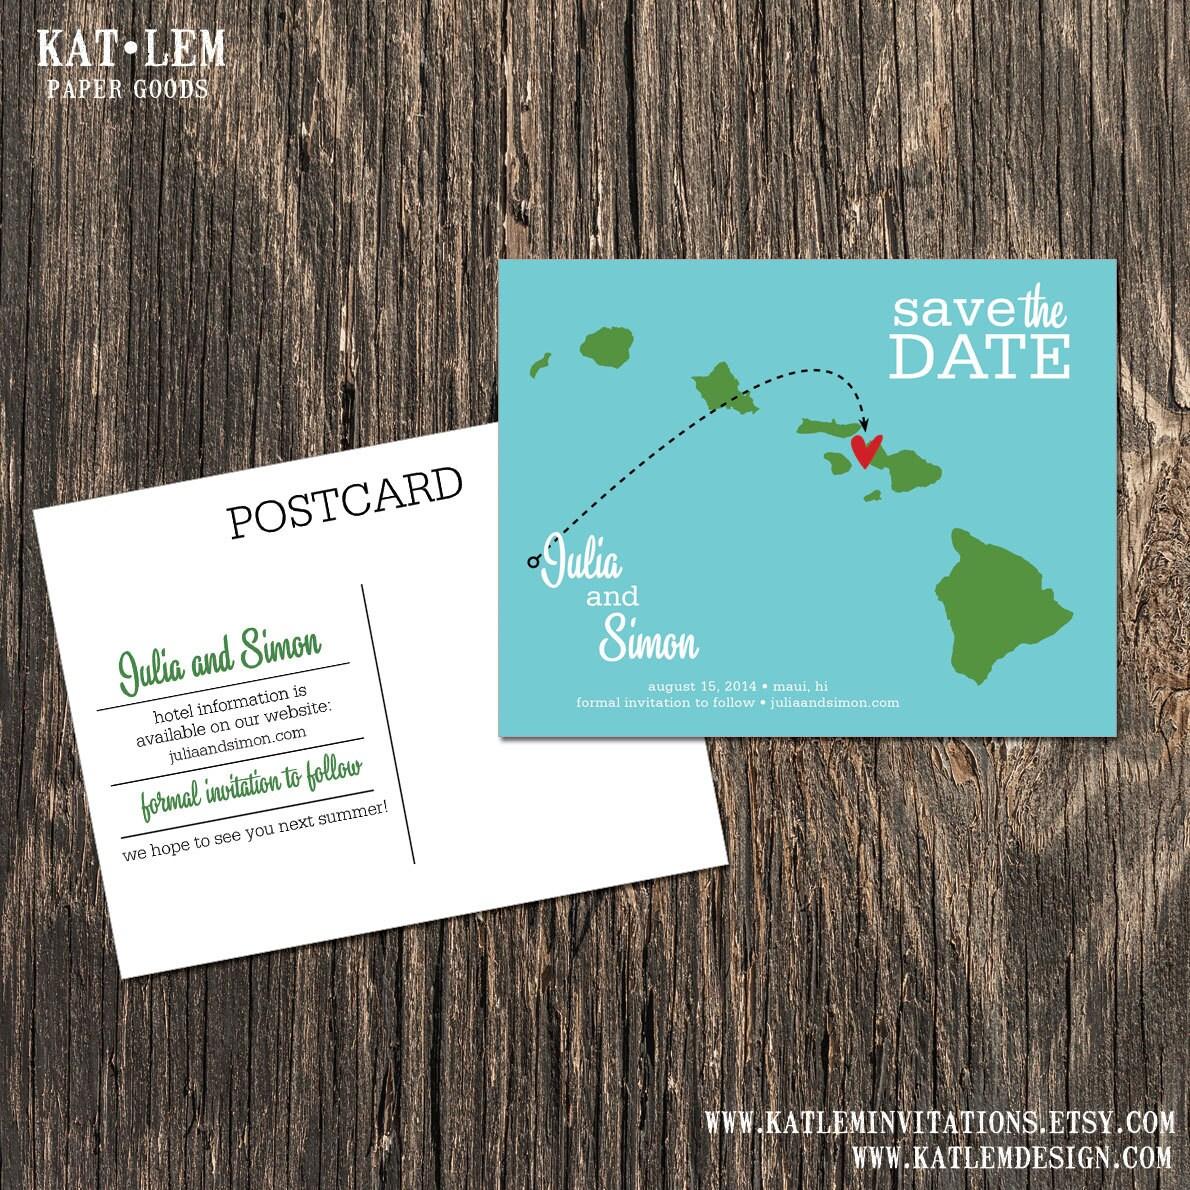 Dating in Honolulu Hawaii (HI) Resource Guide for